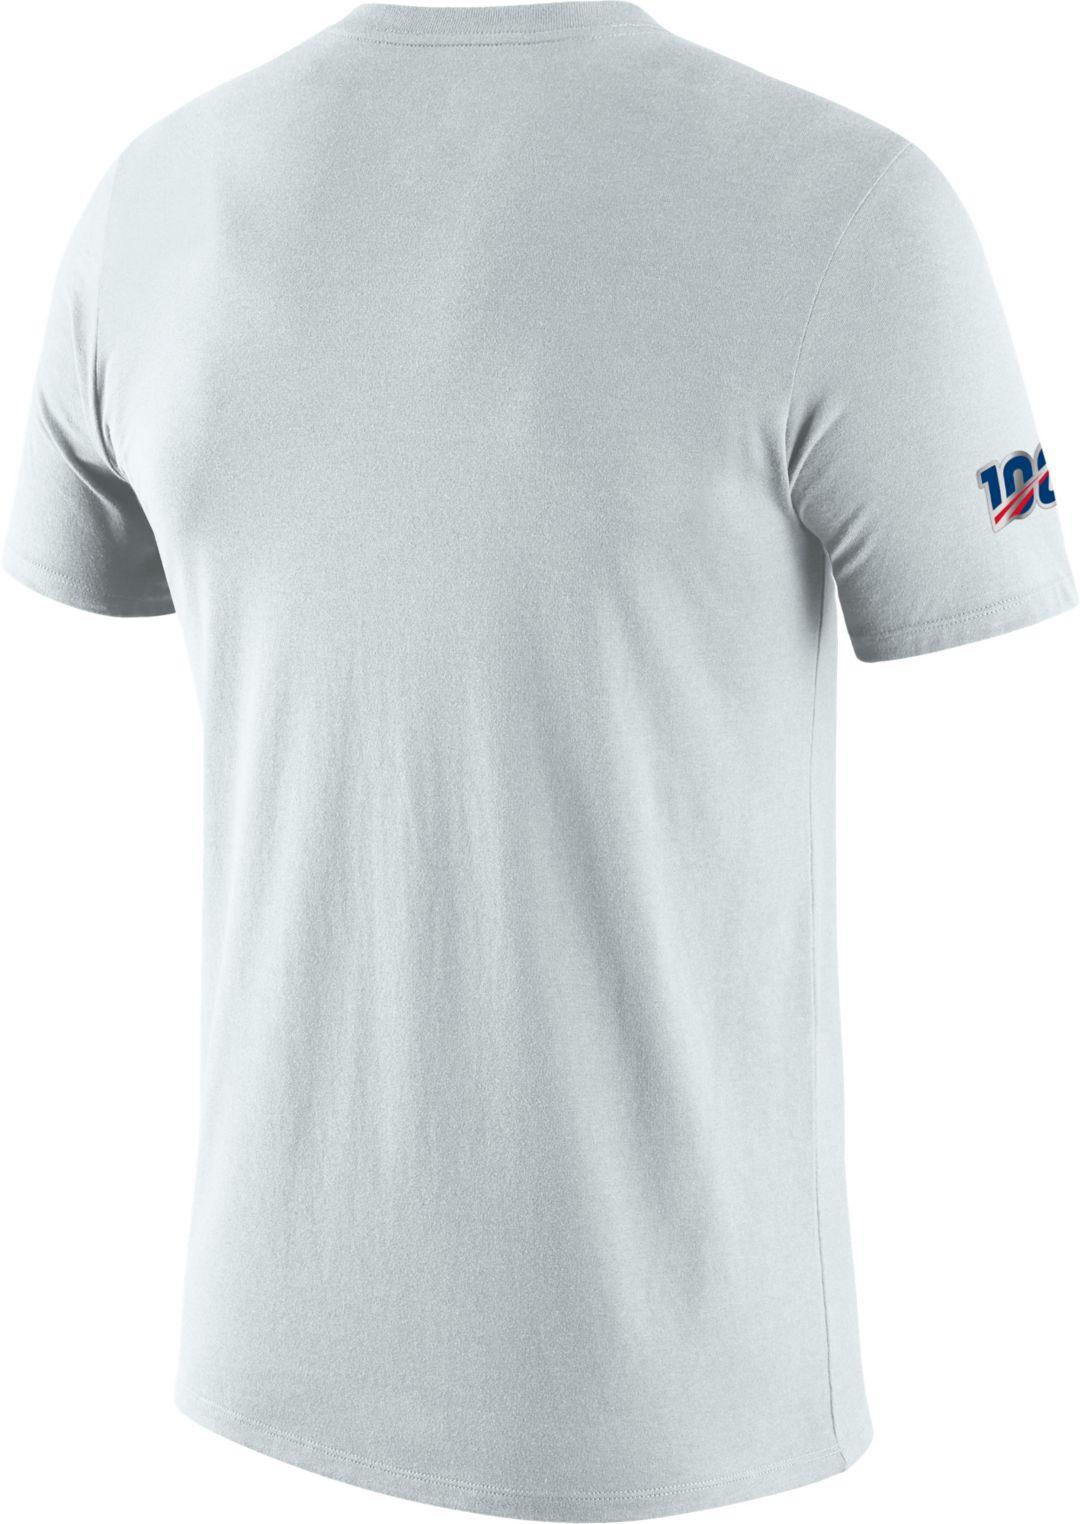 05cef004 Nike Men's Kansas City Chiefs 100th Sideline Legend Performance White  T-Shirt